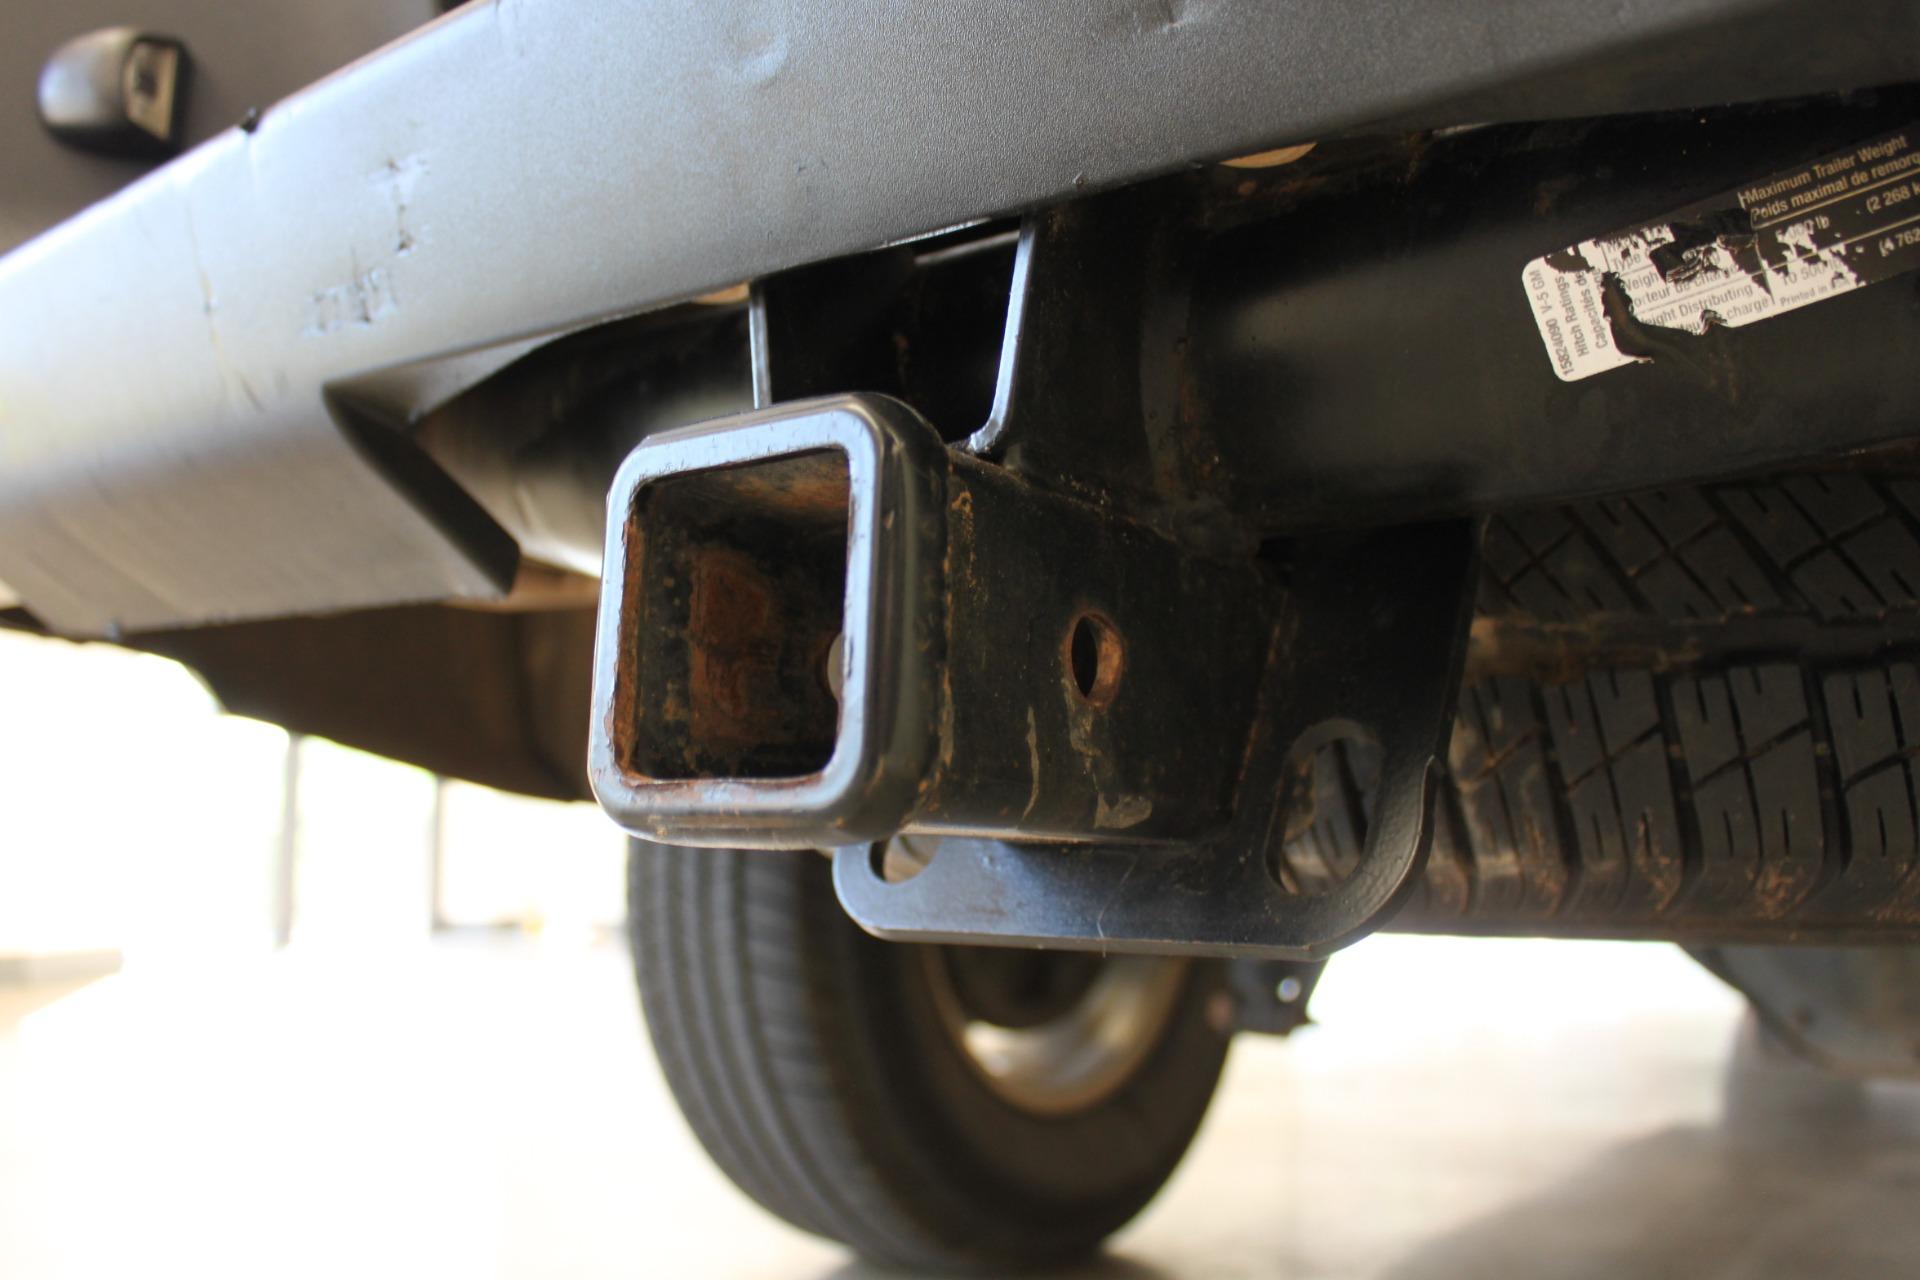 Used-2013-GMC-Sierra-1500-SLE-Z71-4X4-Ford